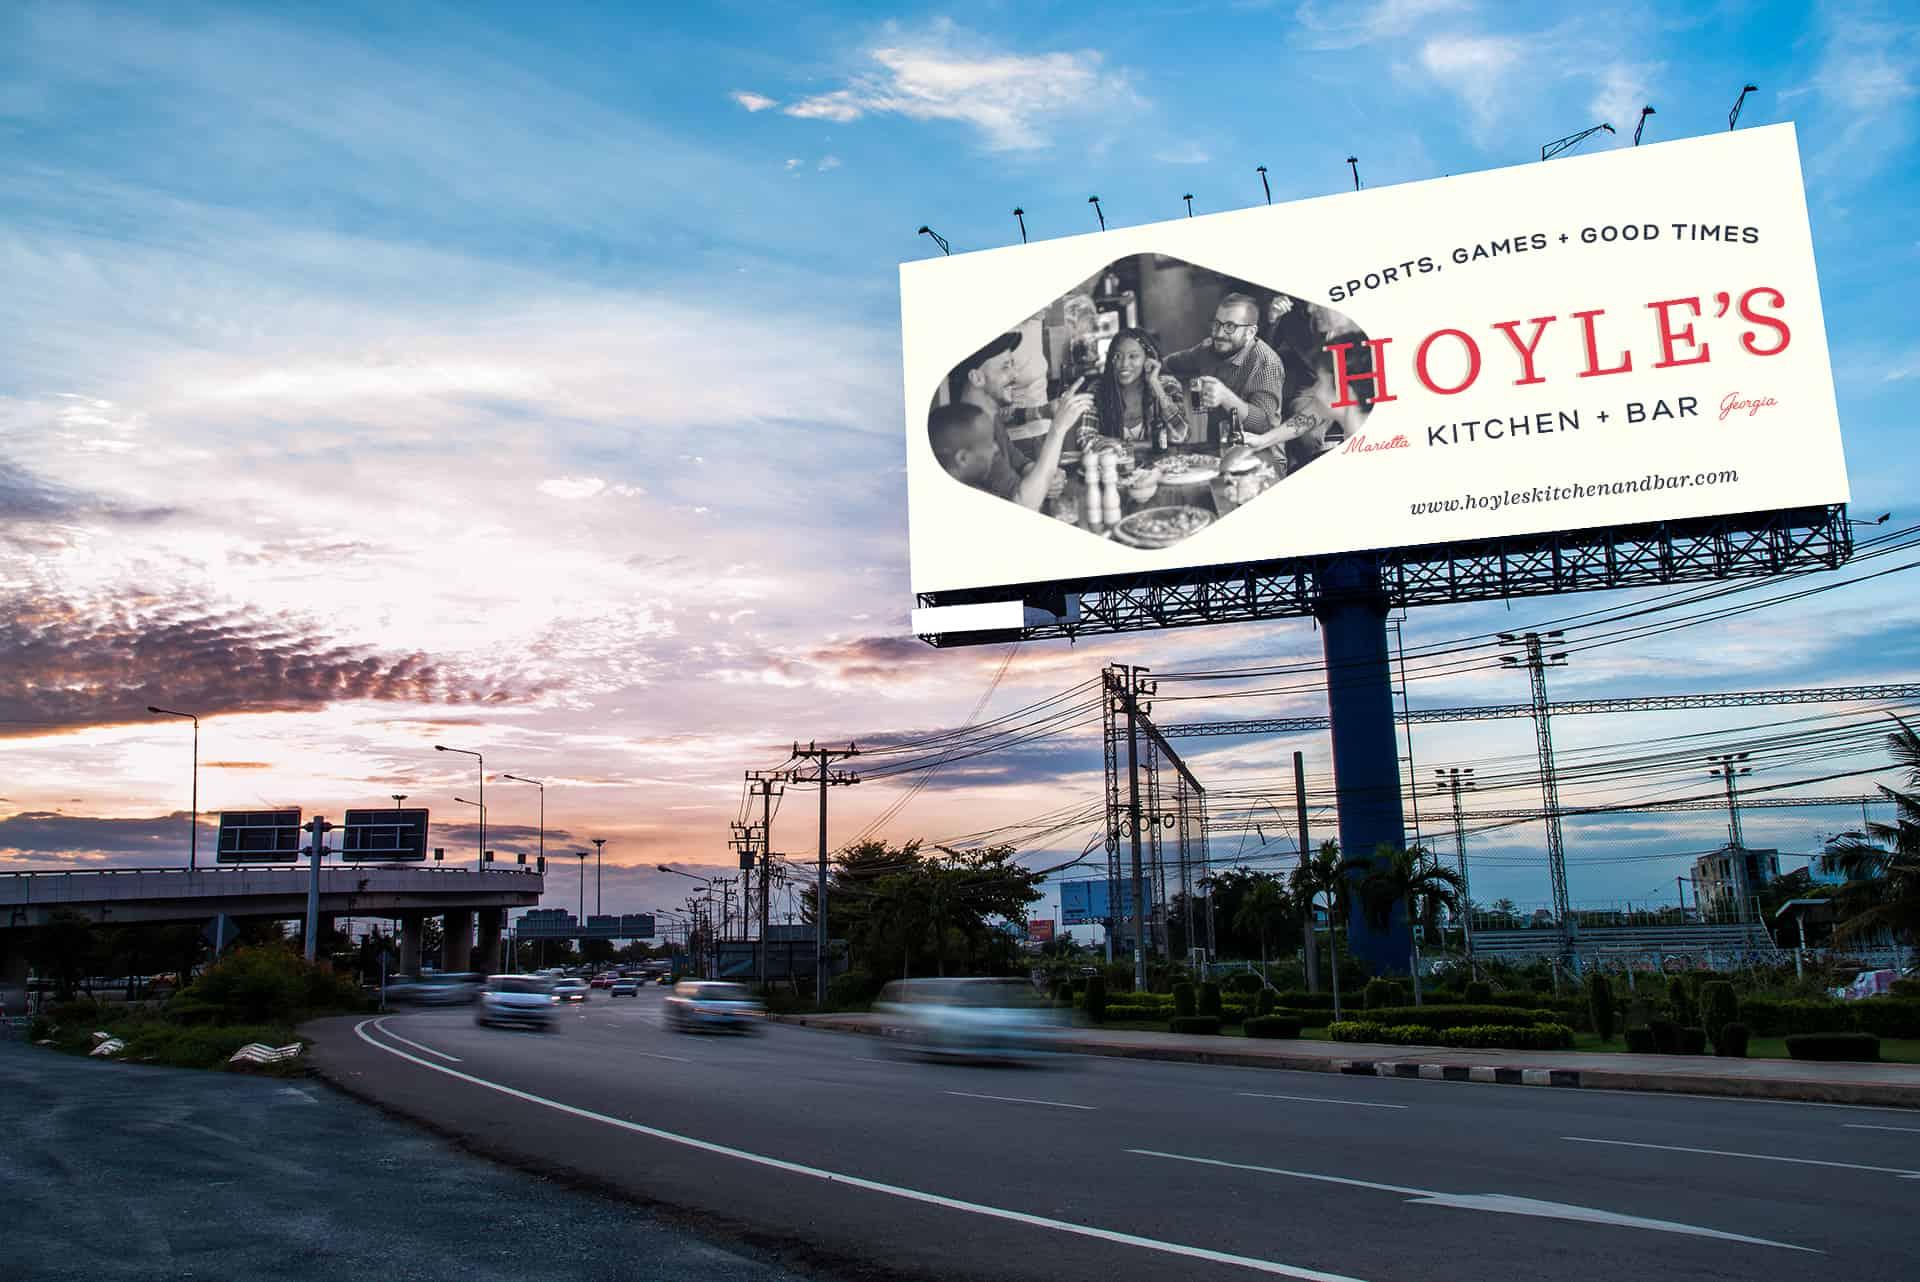 Hoyle's Kitchen & Bar restaurant rebranding and design marketing and advertisement design